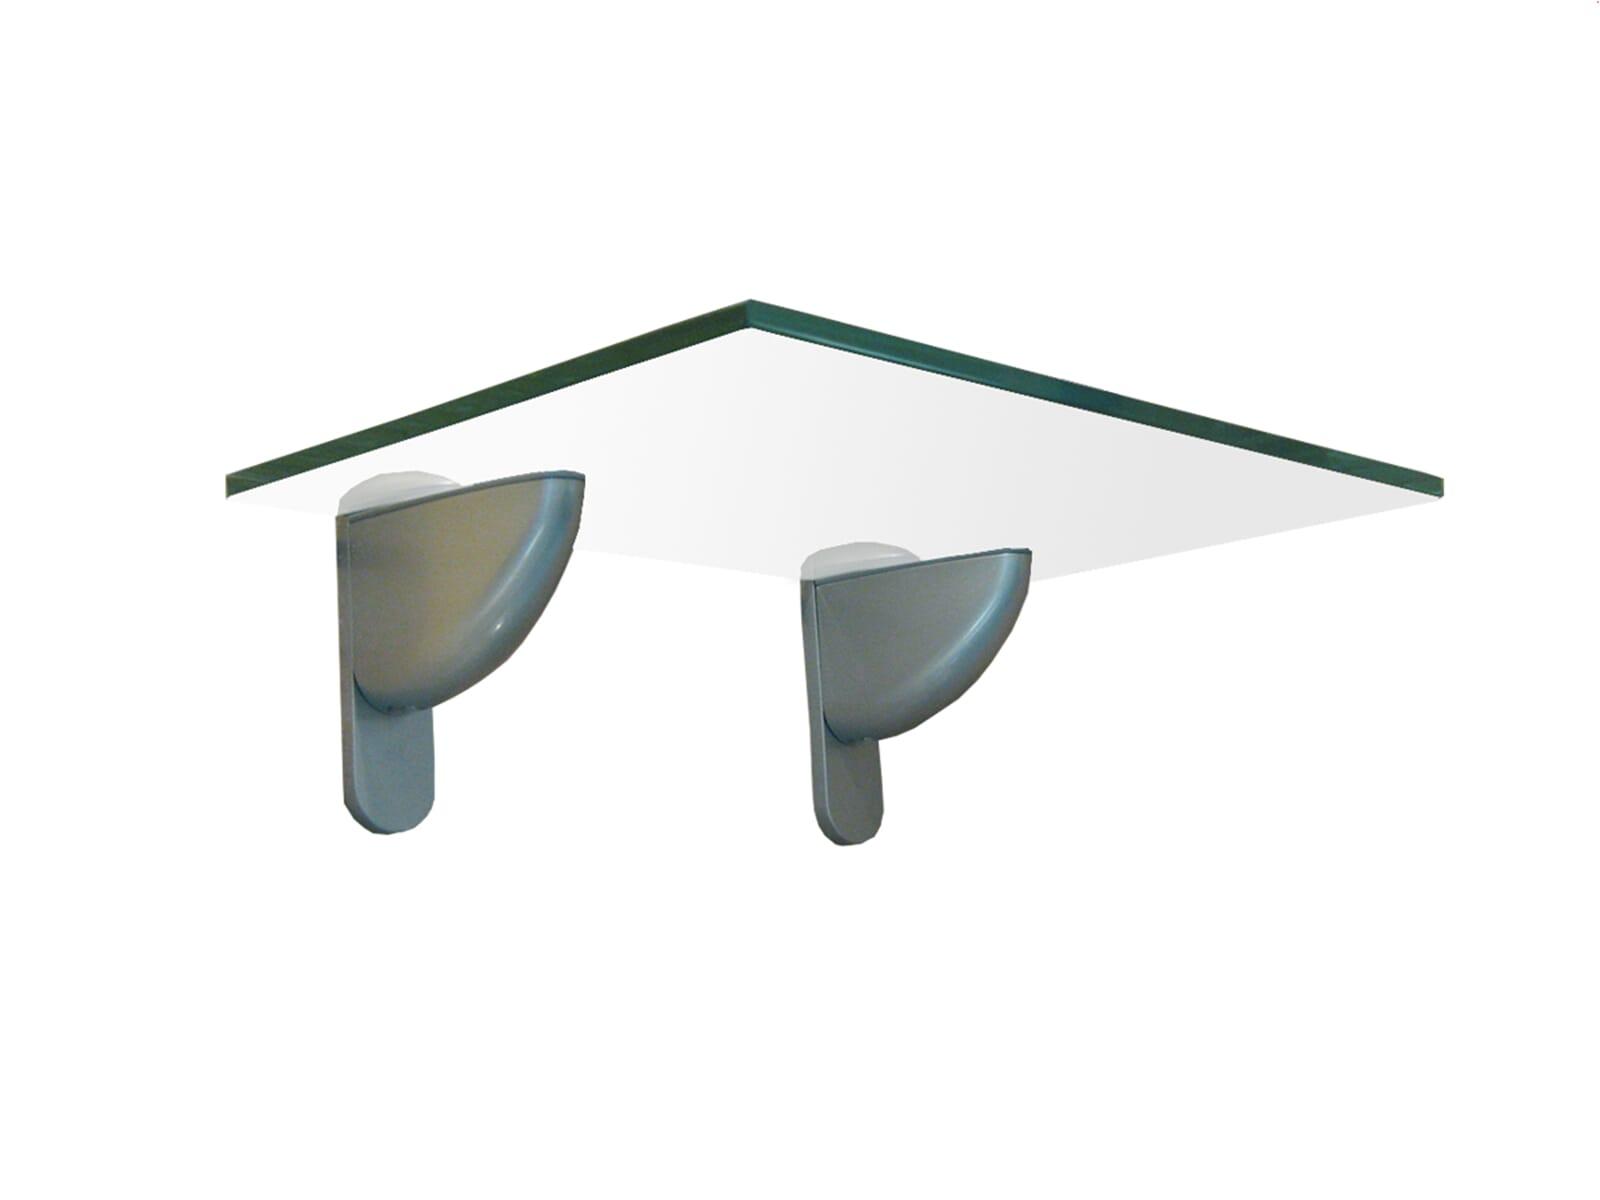 Sagemüller & Rohrer 47511 Glasbodenset mit Klemmträgern